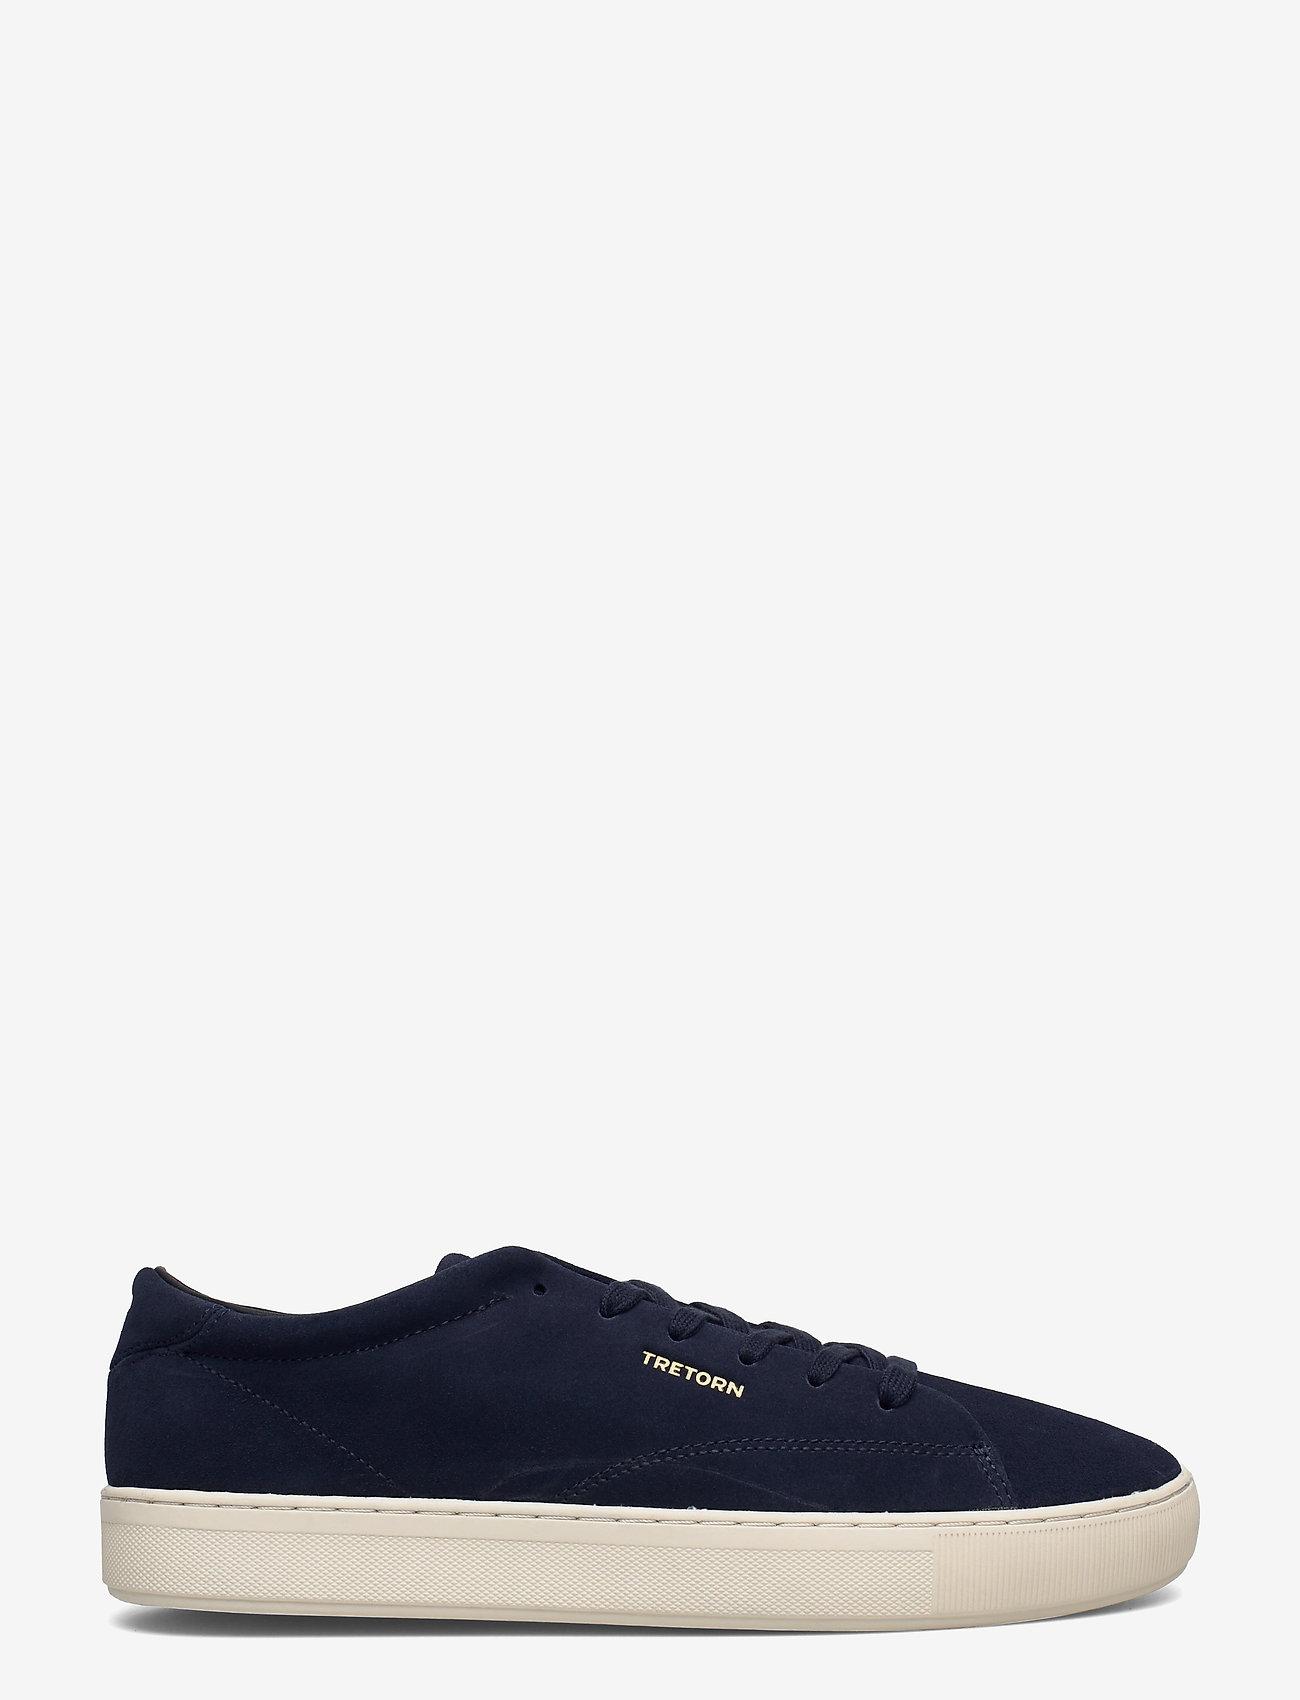 Tretorn - TOURNAMENT SUEDE - låga sneakers - 080/navy - 1